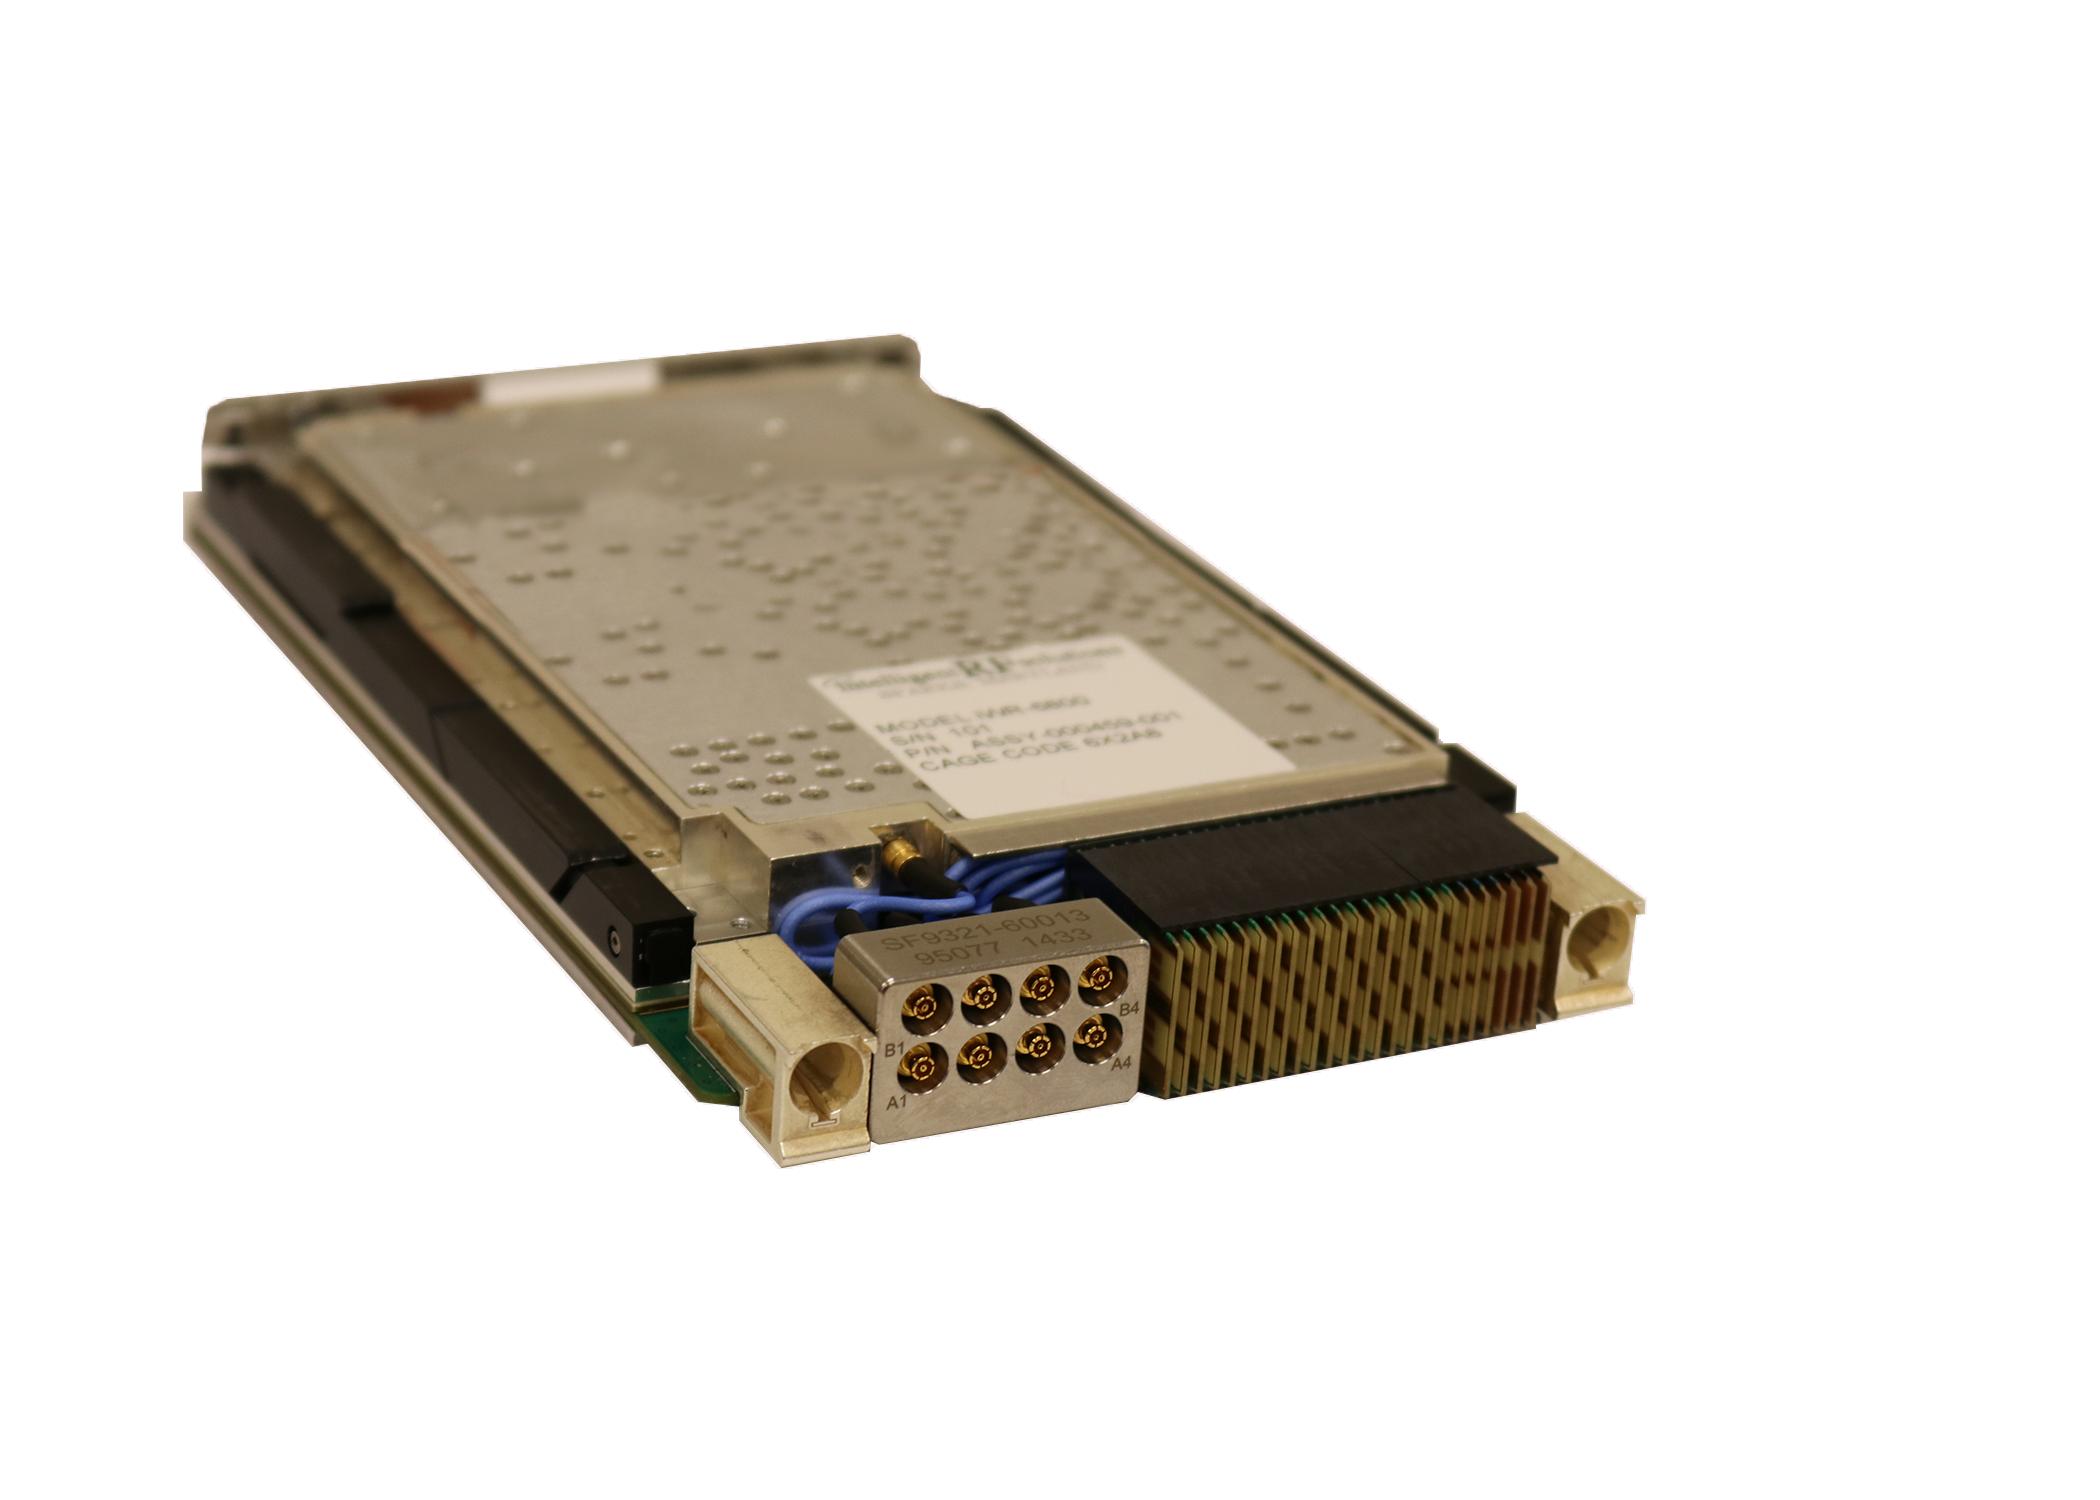 iWR-6800